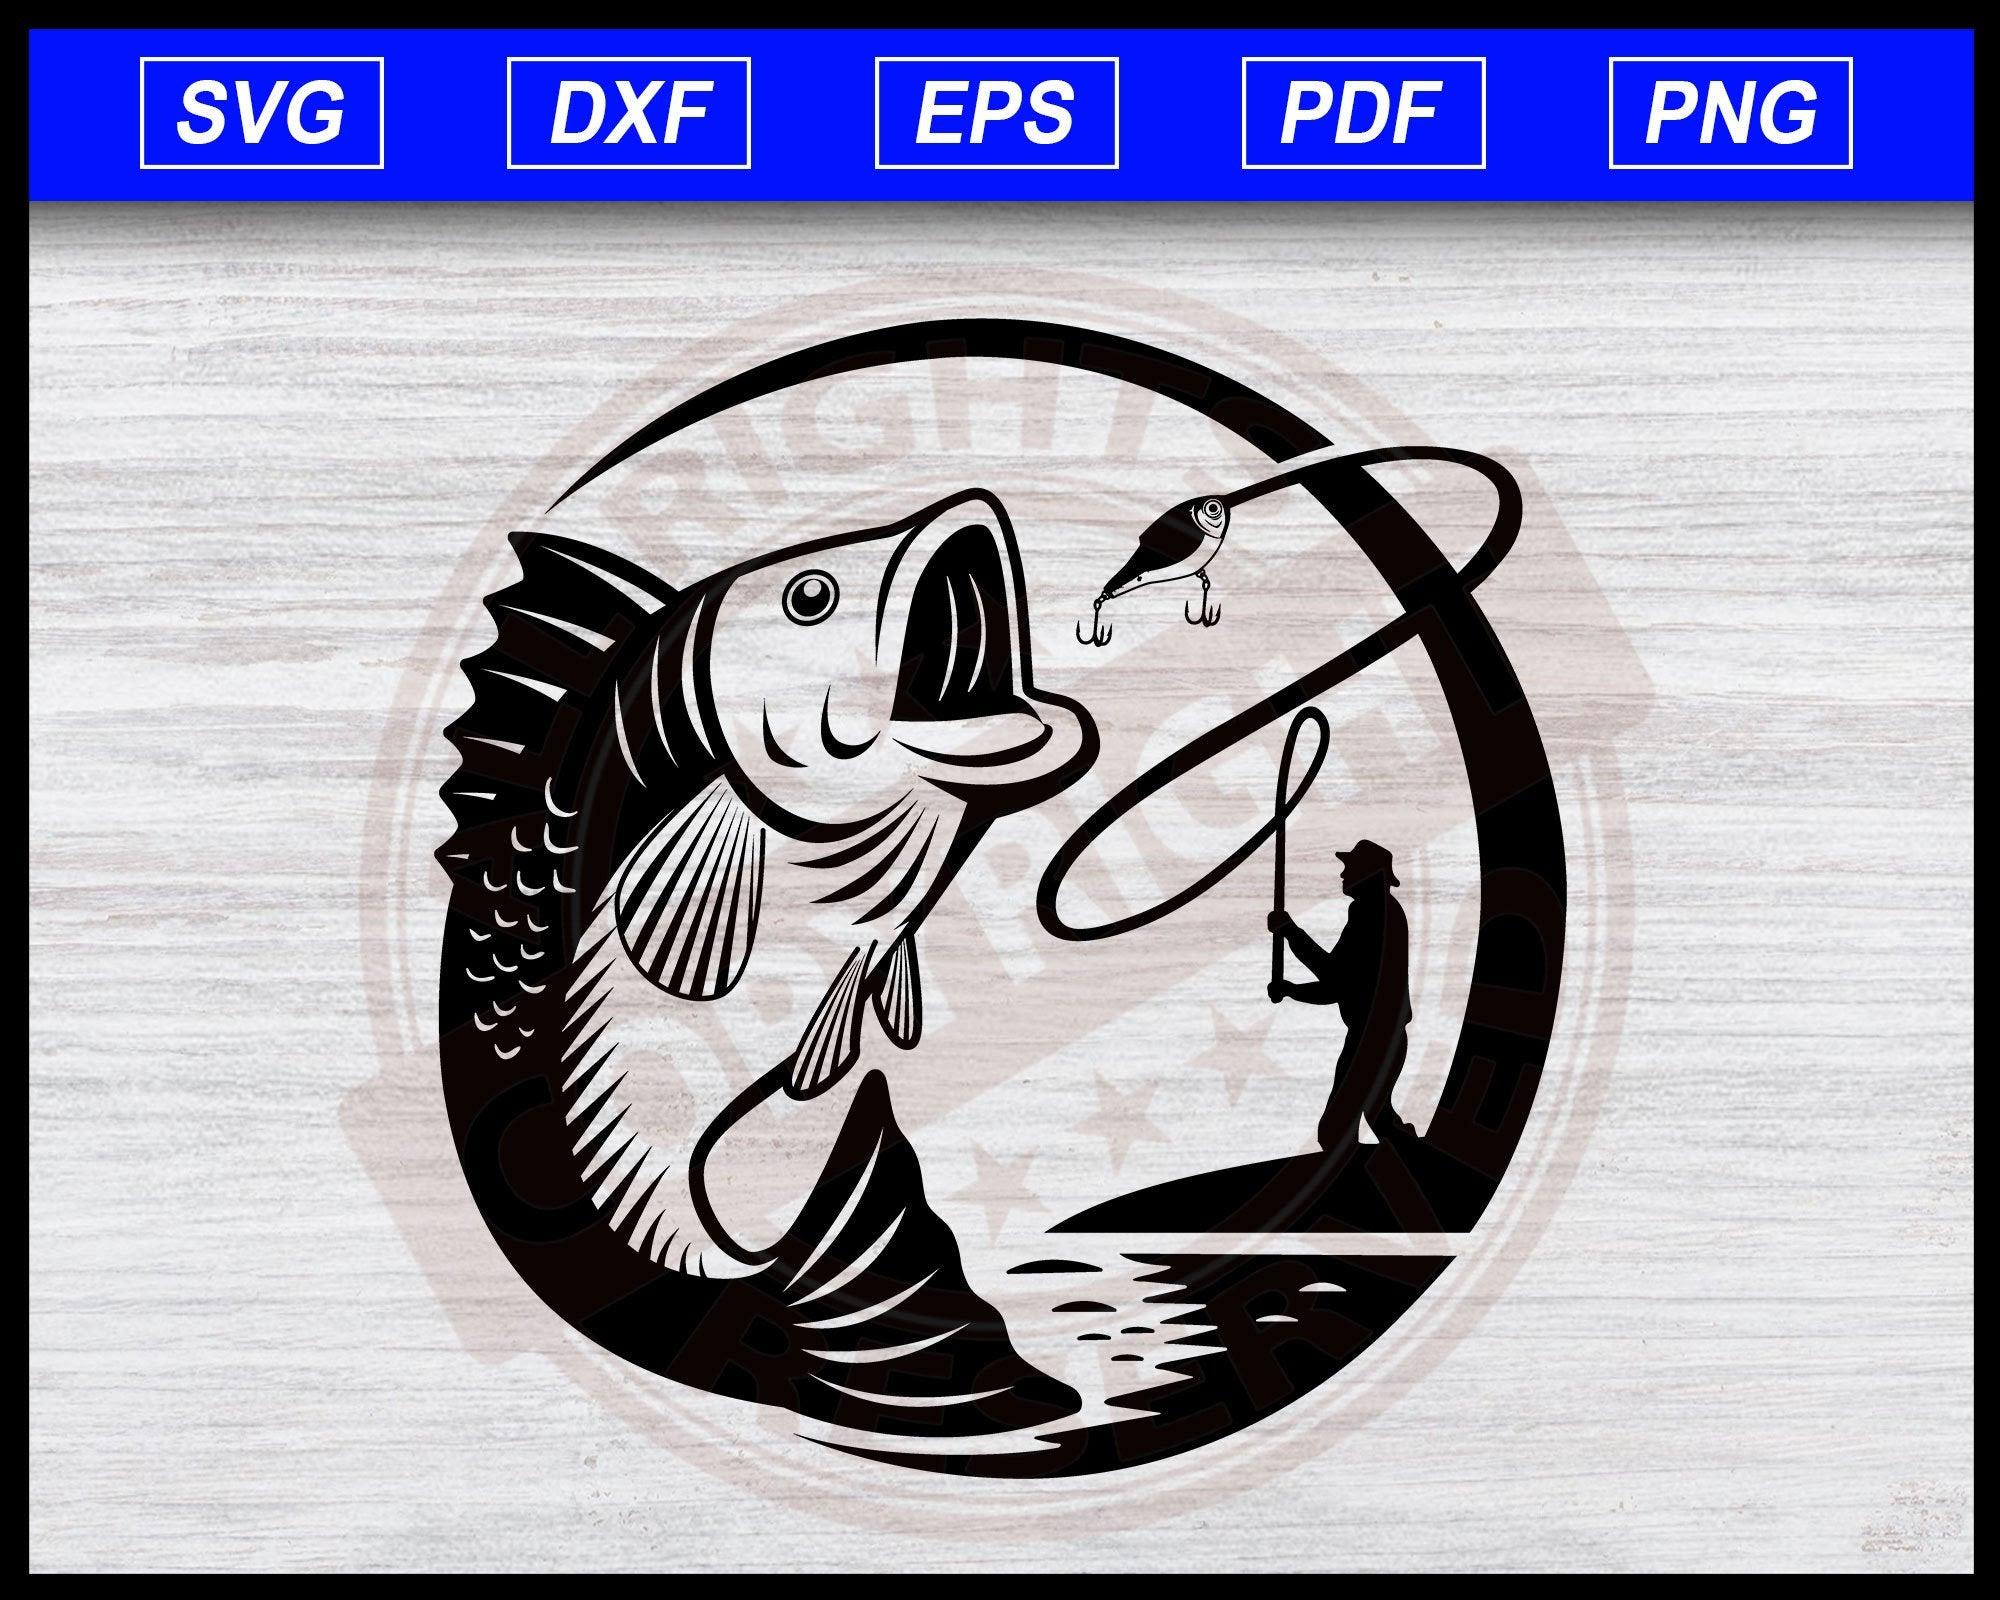 Download Bass Jumping Svg Angler Fishing Bass Fishing Clipart Fisherman Catching Fish Svg Cricut Cut Files Silhouette Editable Svg File